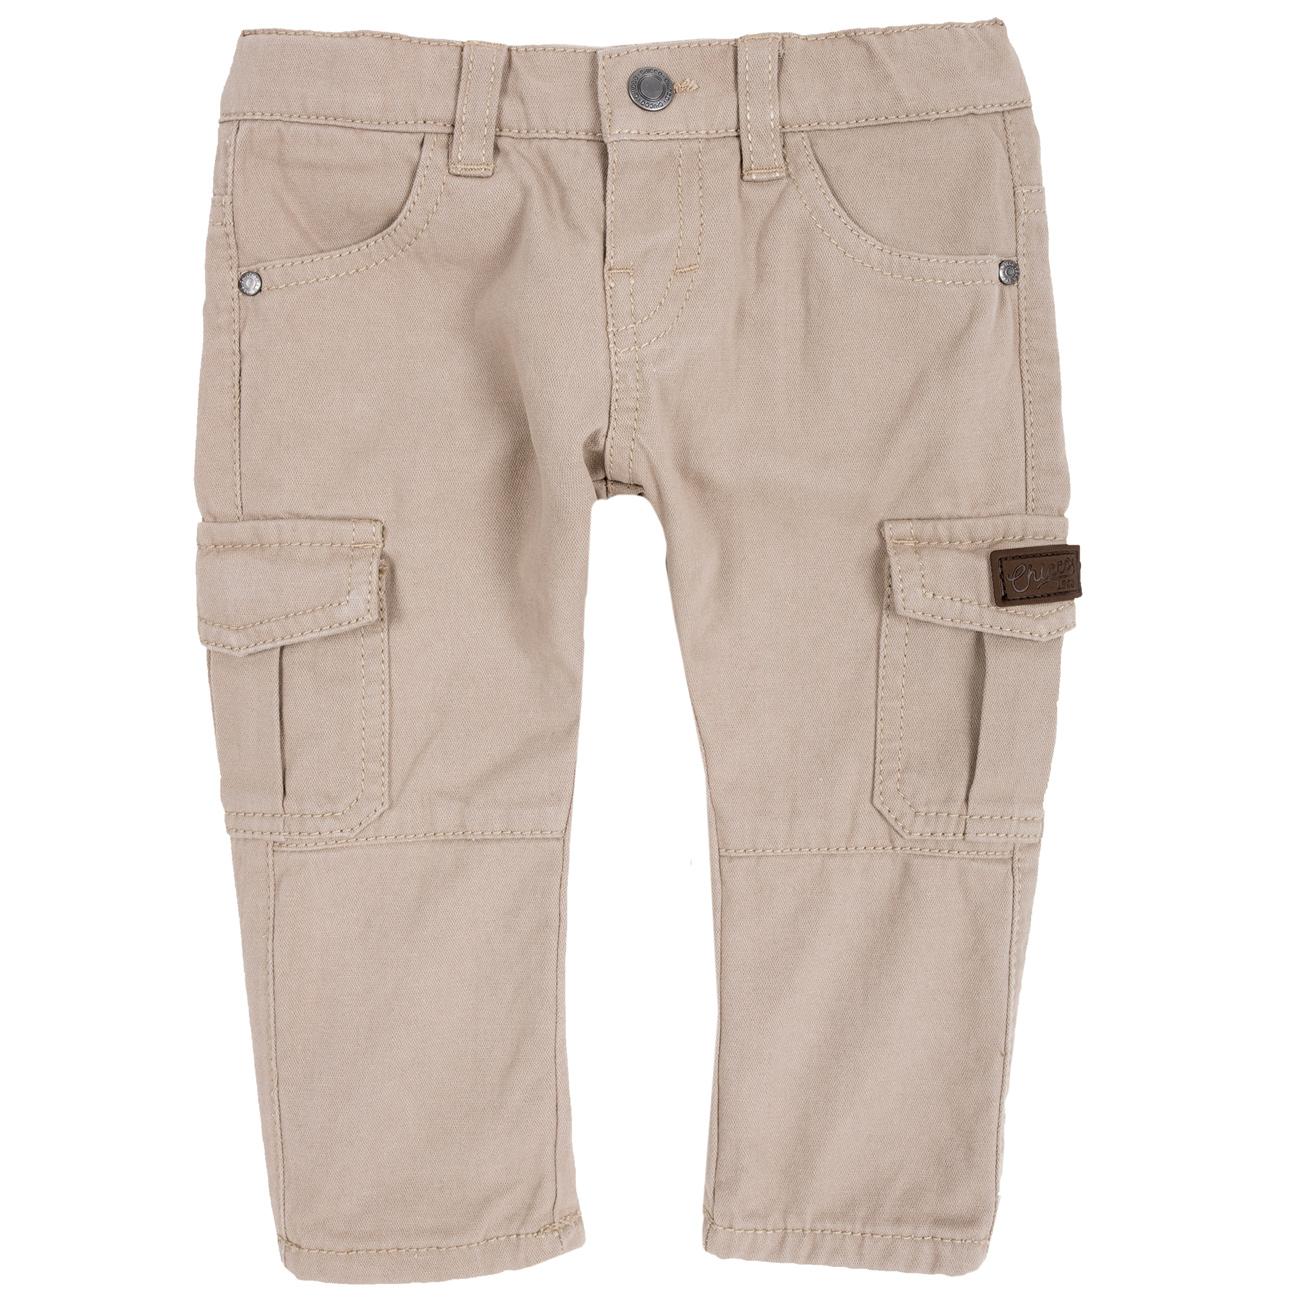 Pantalon Copii Chicco, Maro Deschis imagine